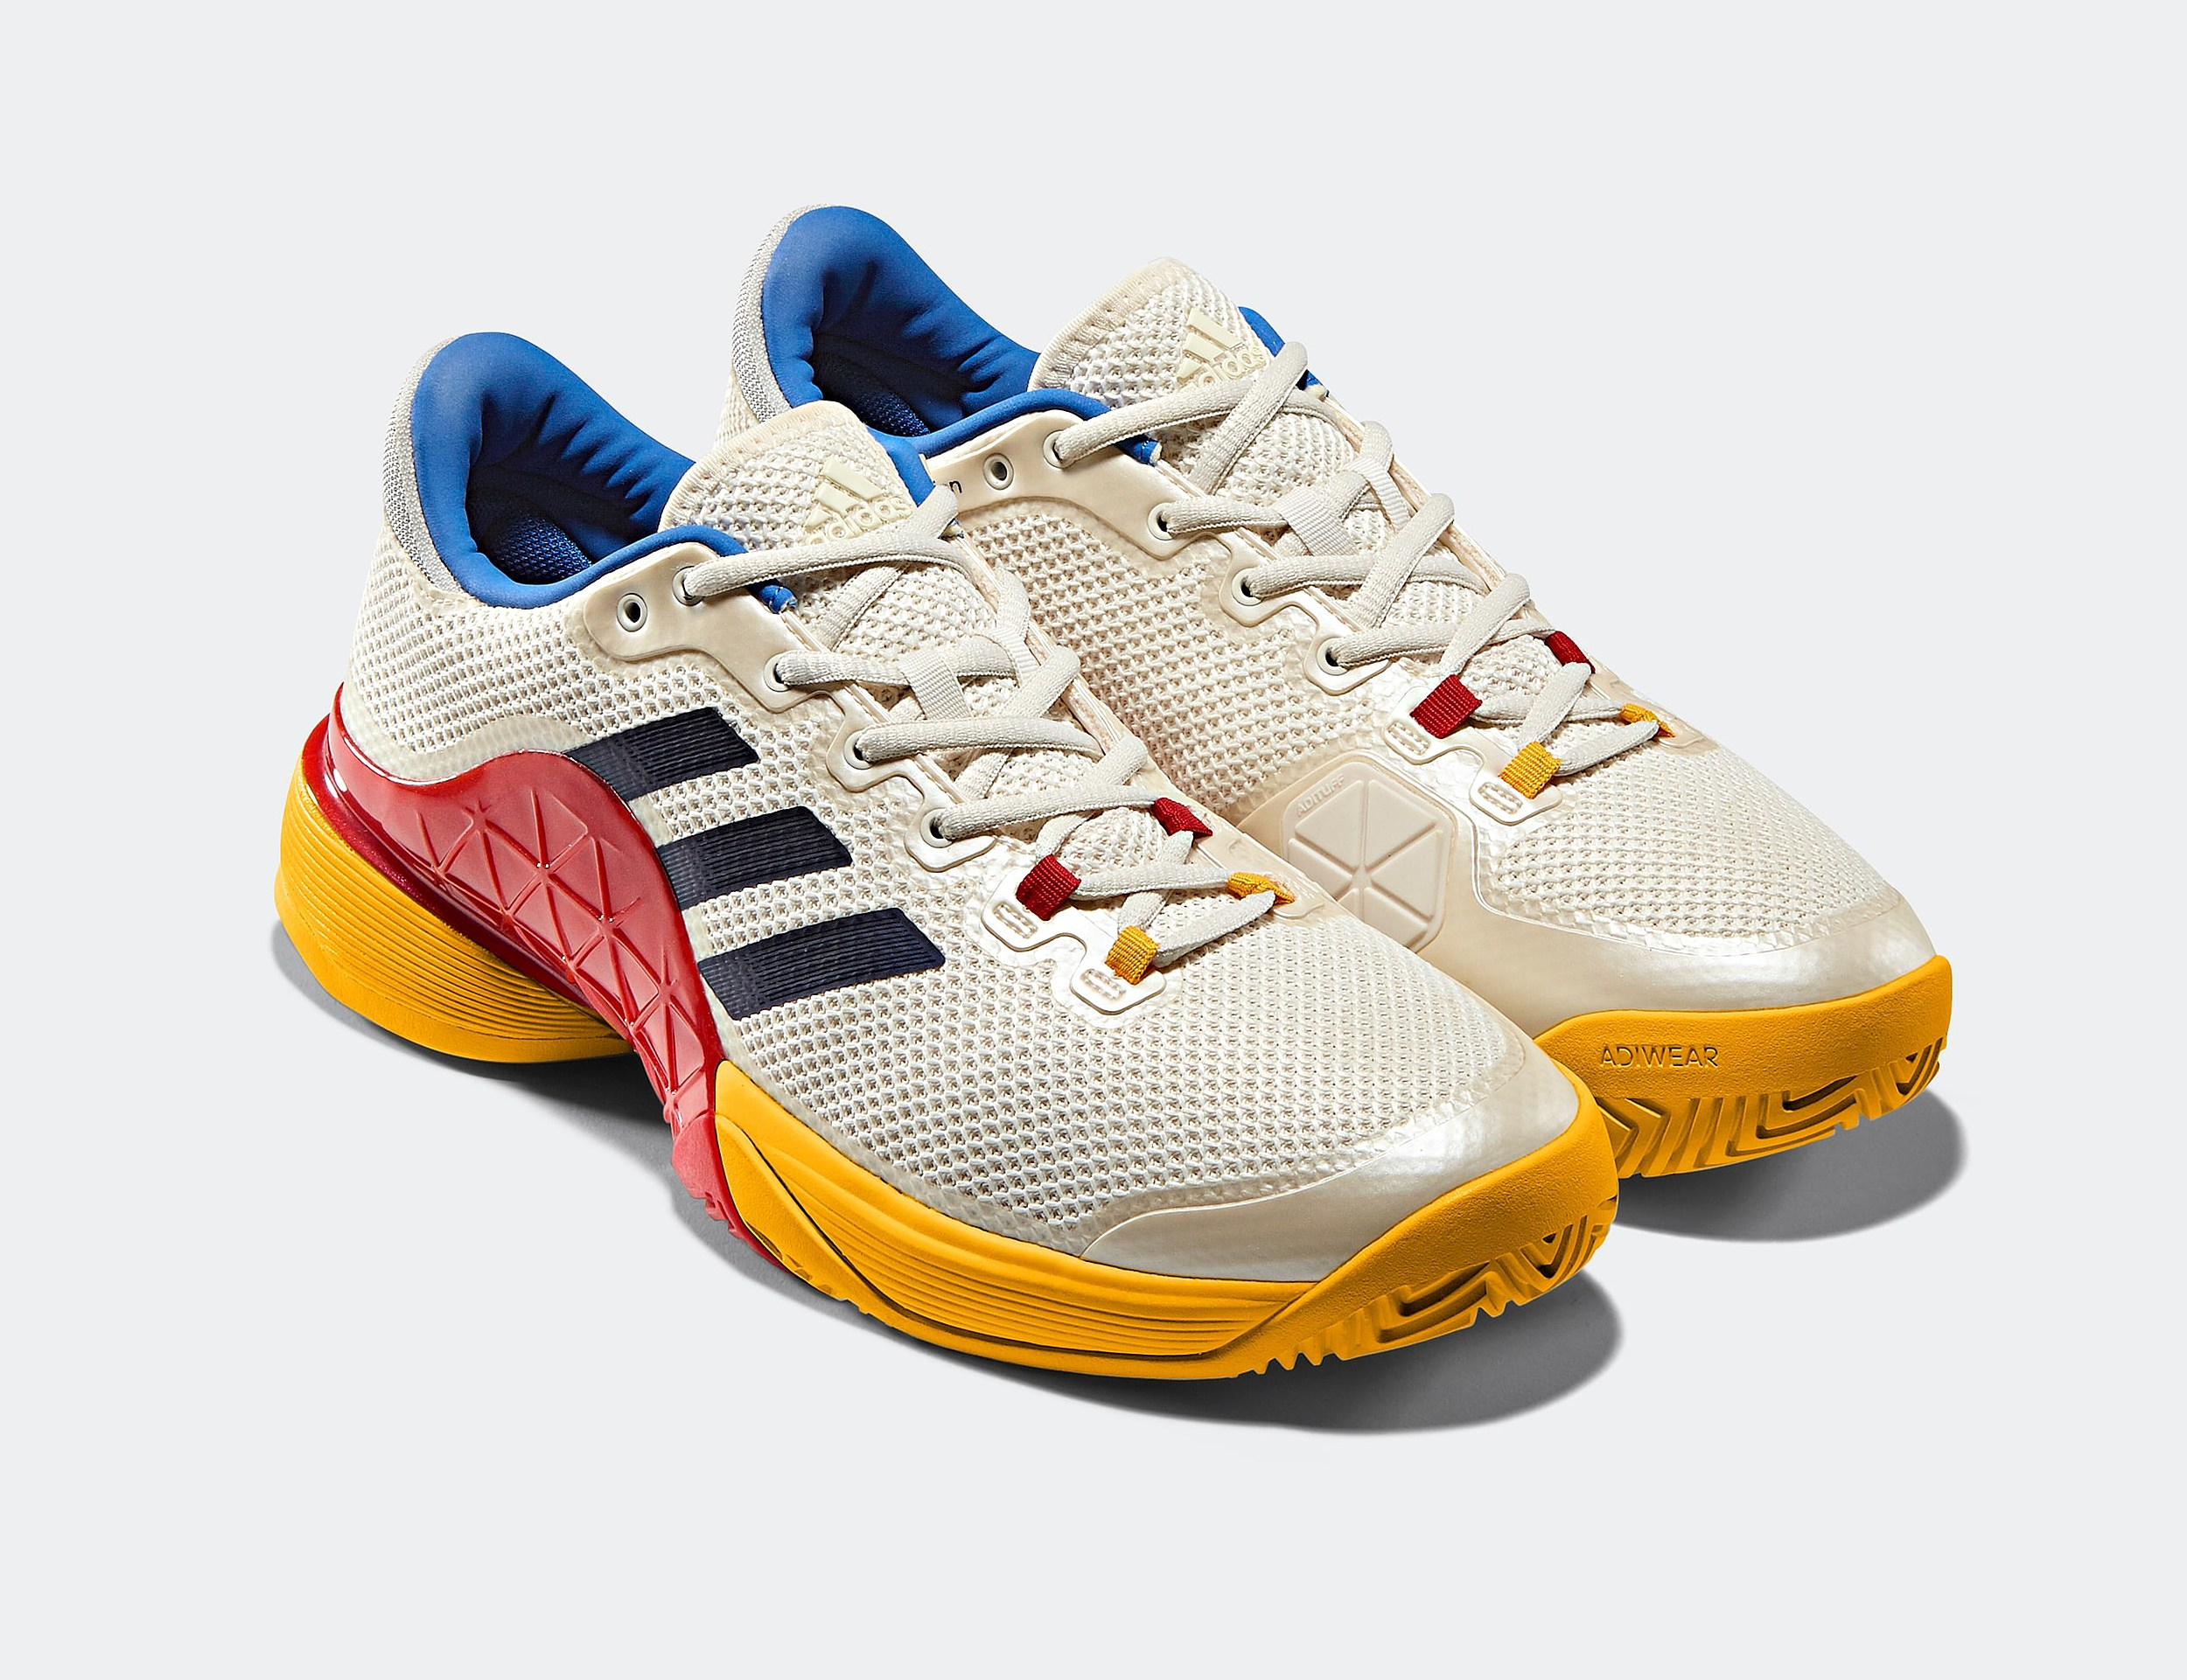 015246f47bb67 Pharrell x adidas Tennis Collection